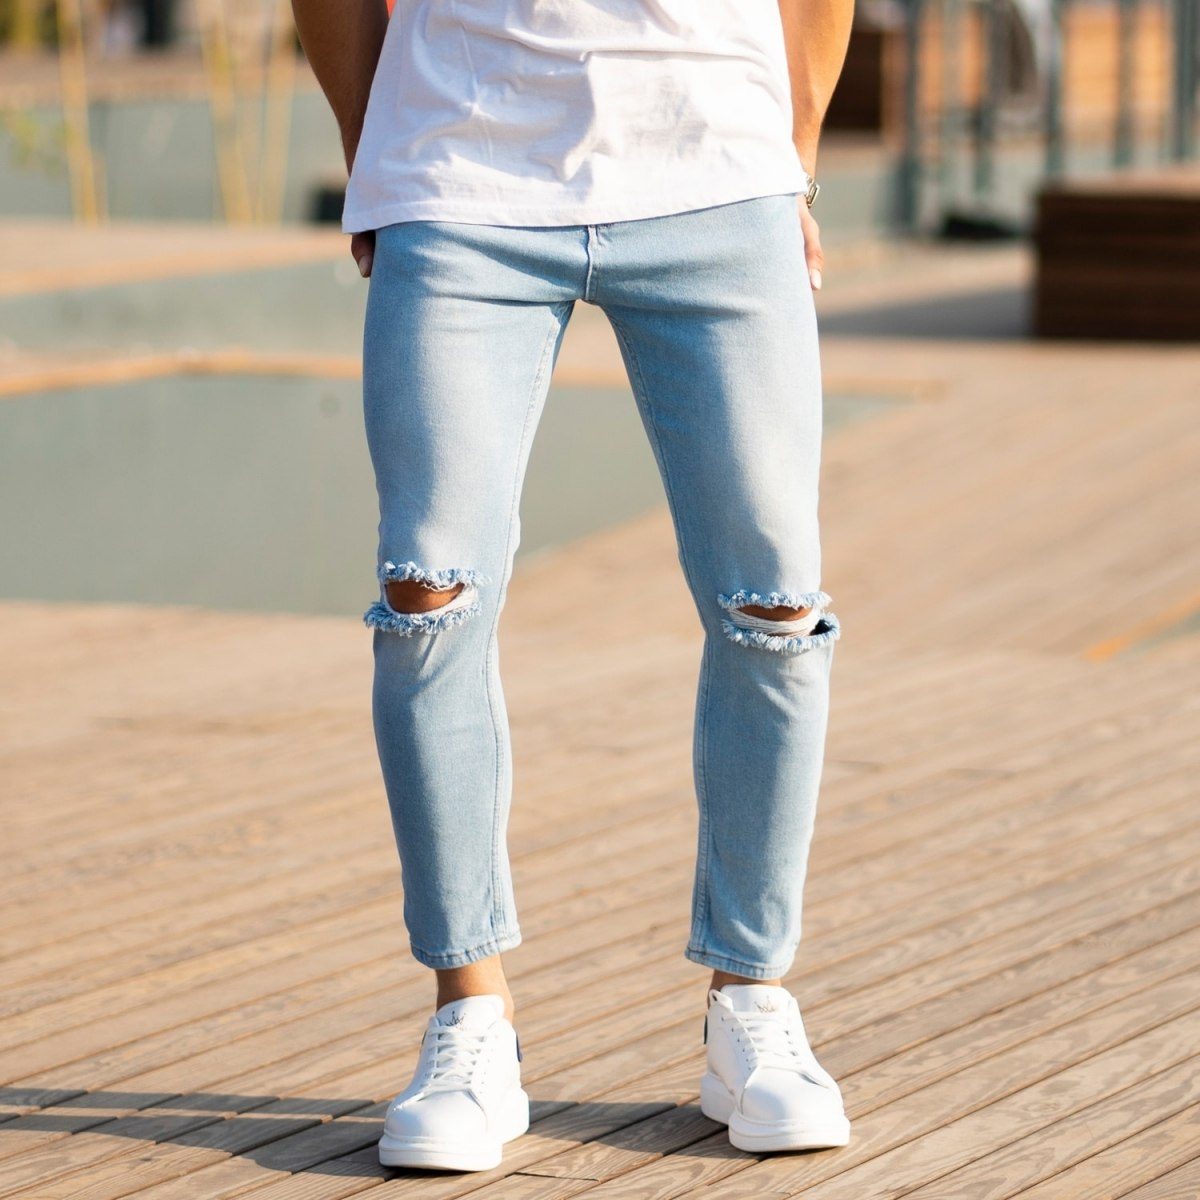 Men's Light-Blue Jeans With Rips Mv Premium Brand - 1